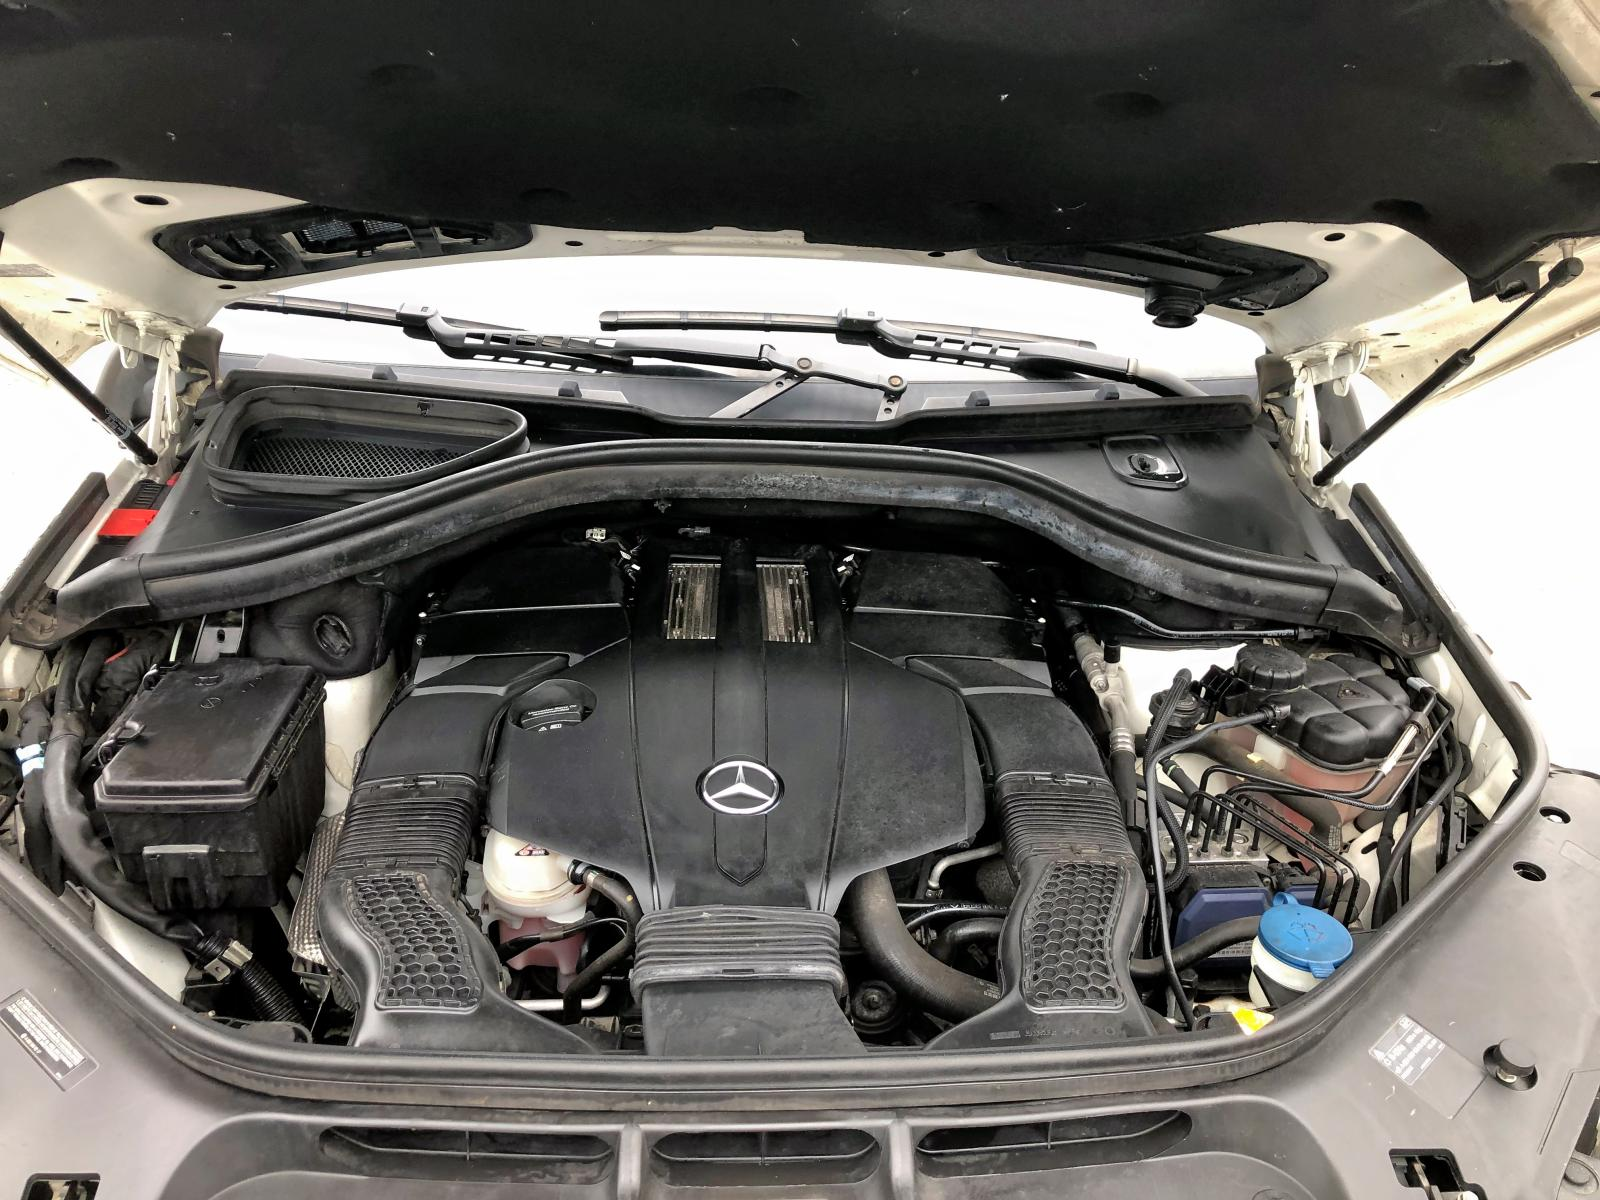 4JGDF6EE7FA492290 - 2015 Mercedes-Benz Gl 450 4Ma 3.0L front view